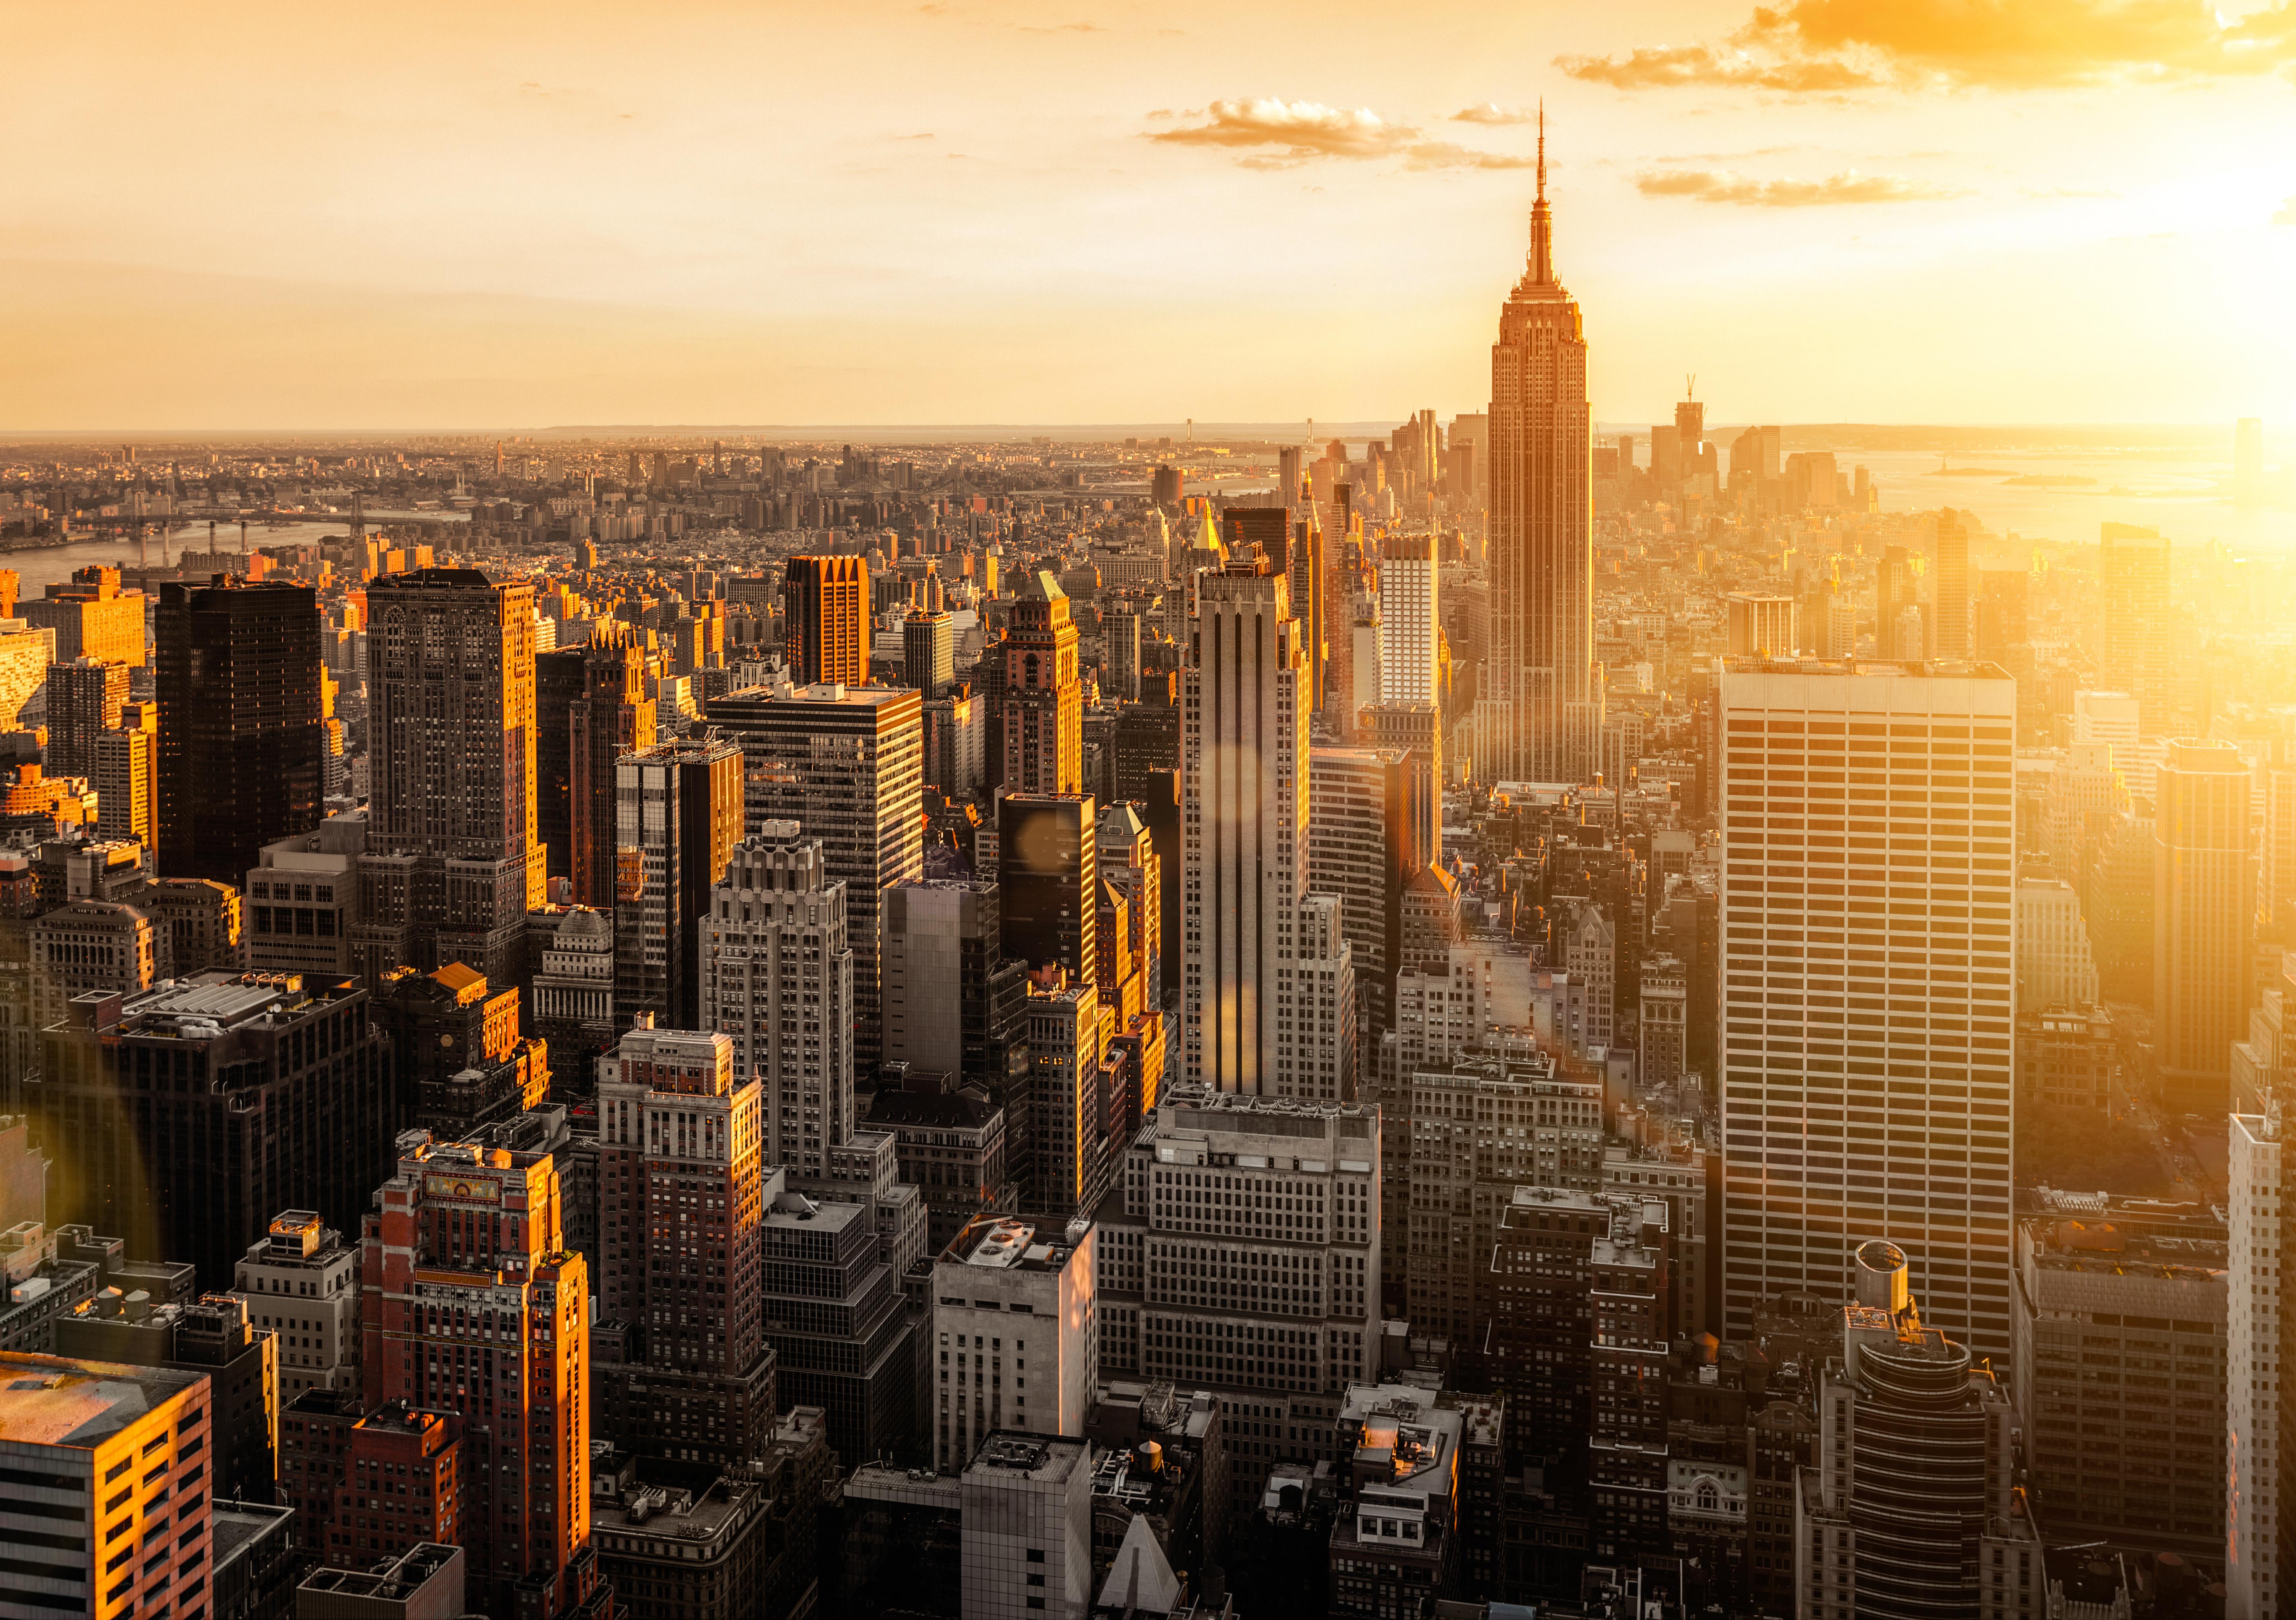 Images New York City USA megalopolis Manhattan Cities Houses Megapolis Building